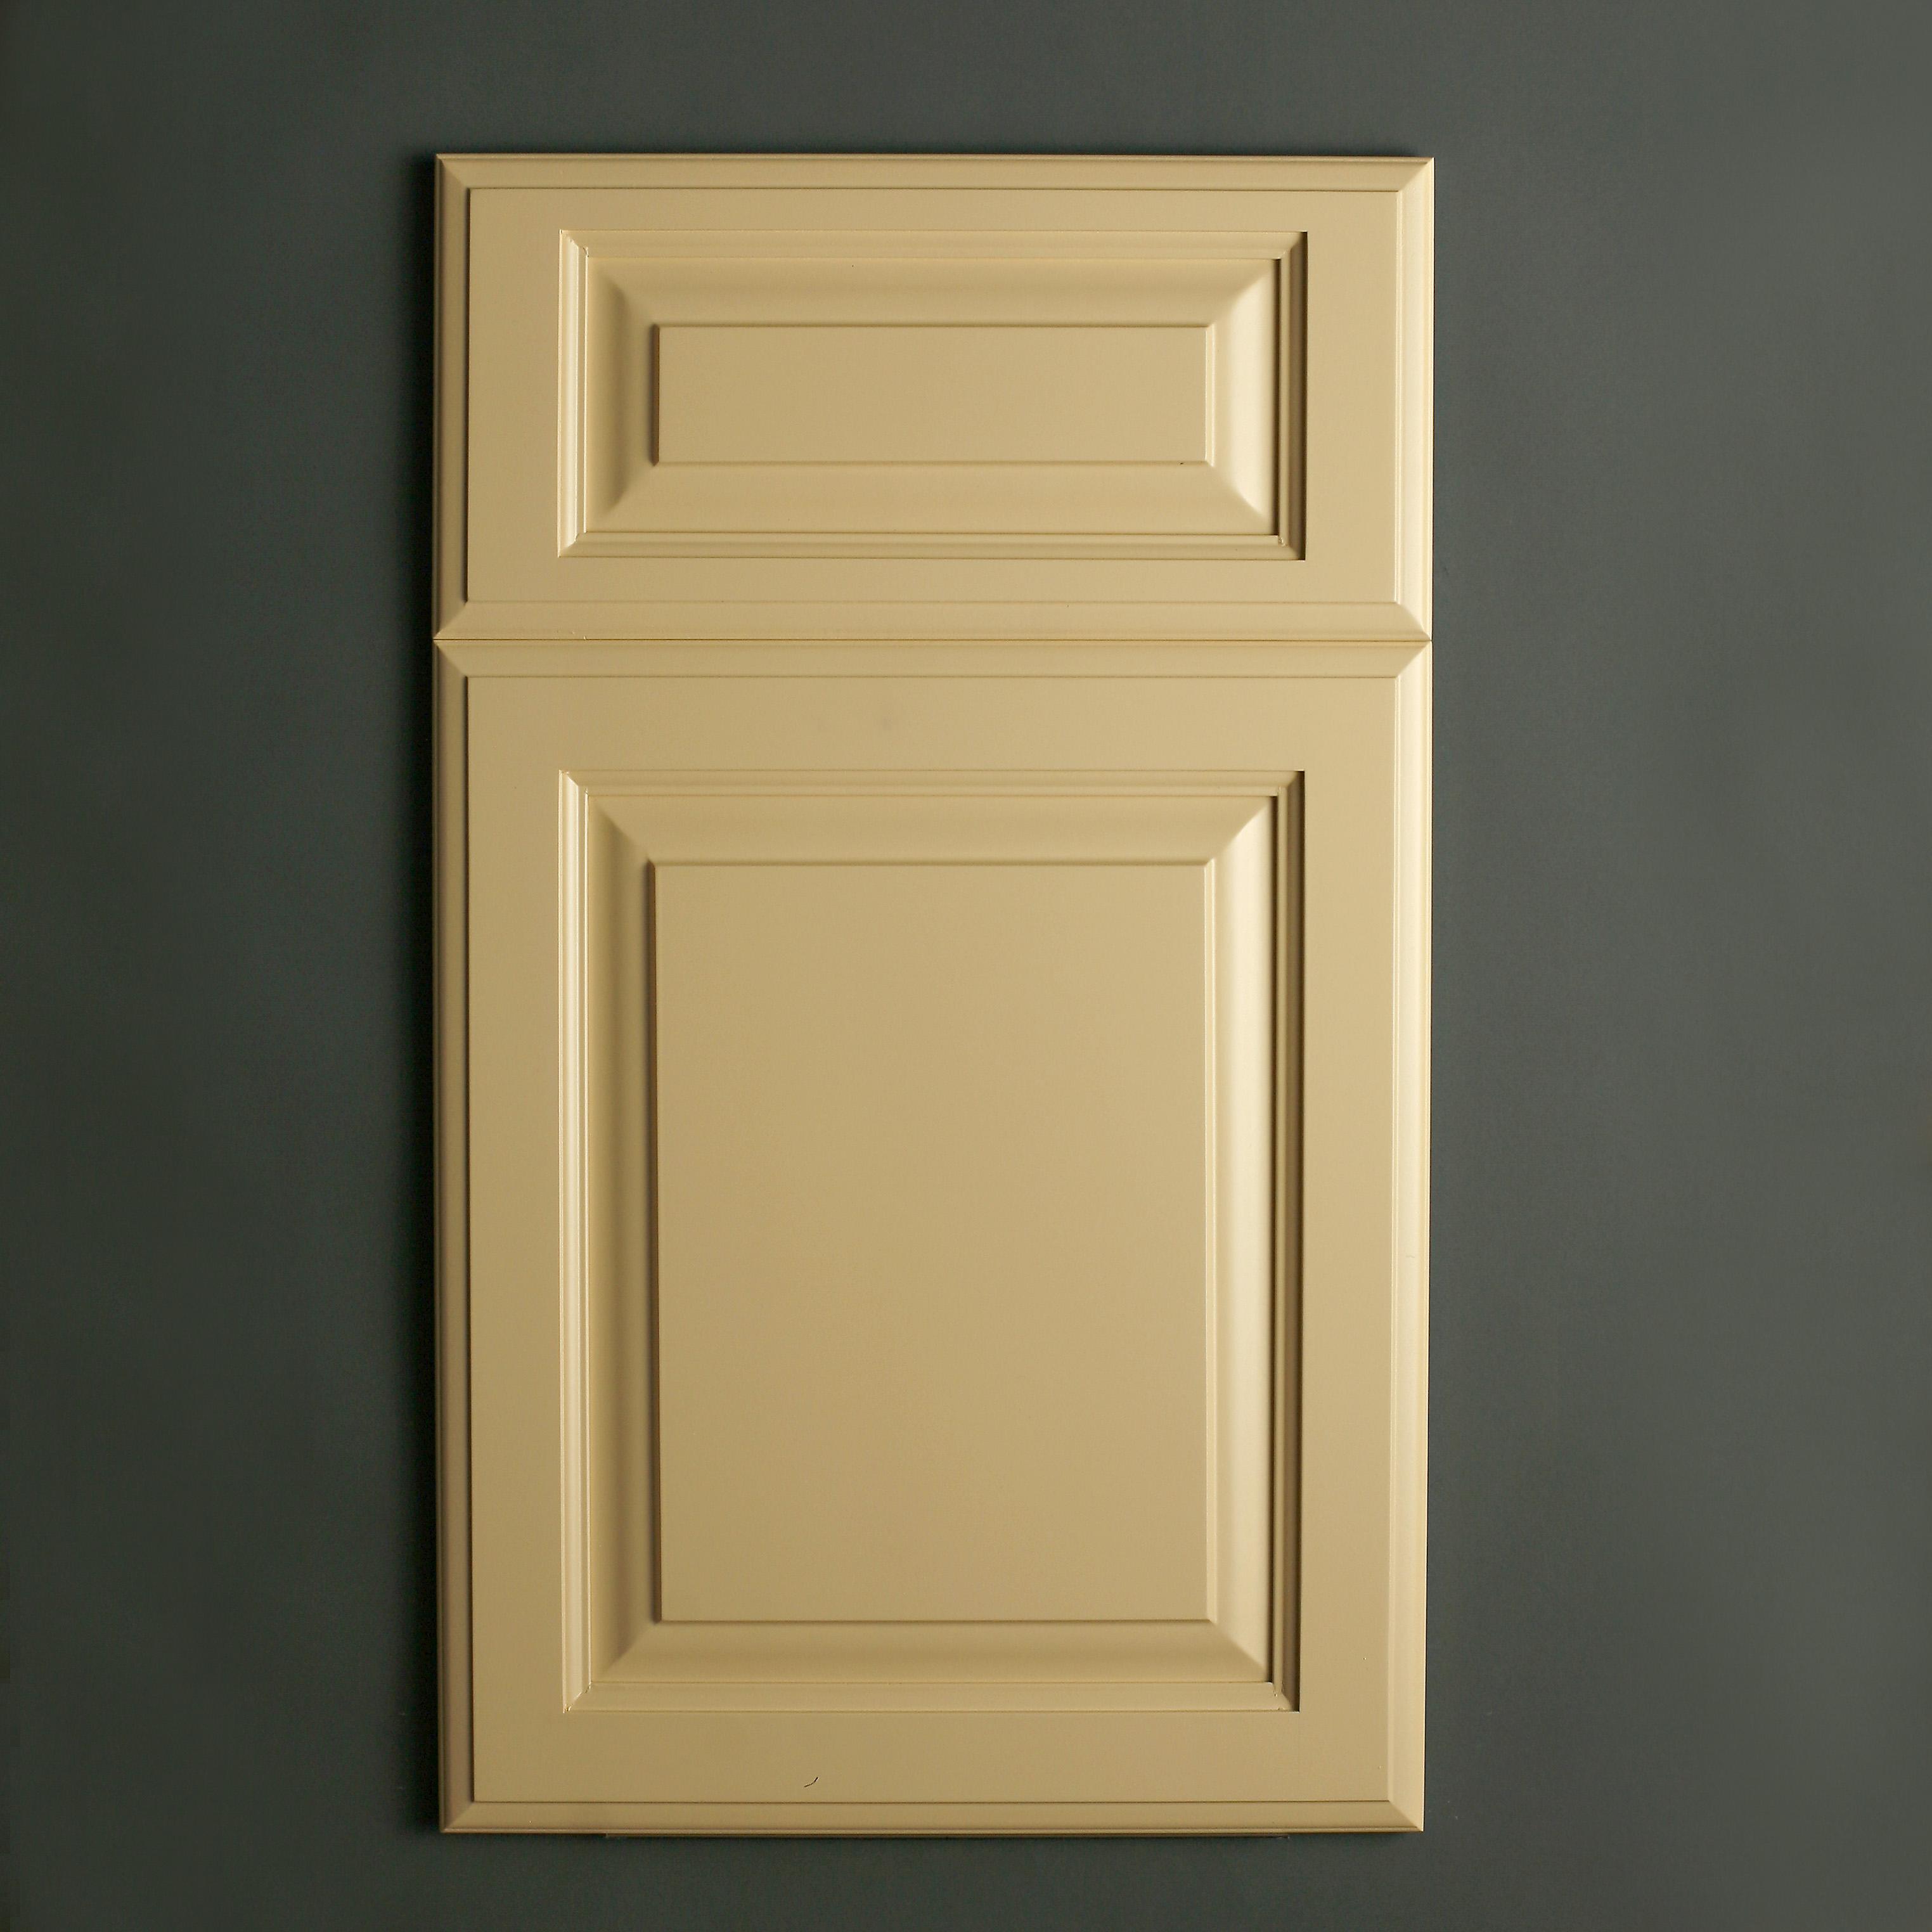 Replacing Cabinet Doors 100 Kitchen Cabinet Fronts Only Kitchen Cabinet Doors Only Sanding